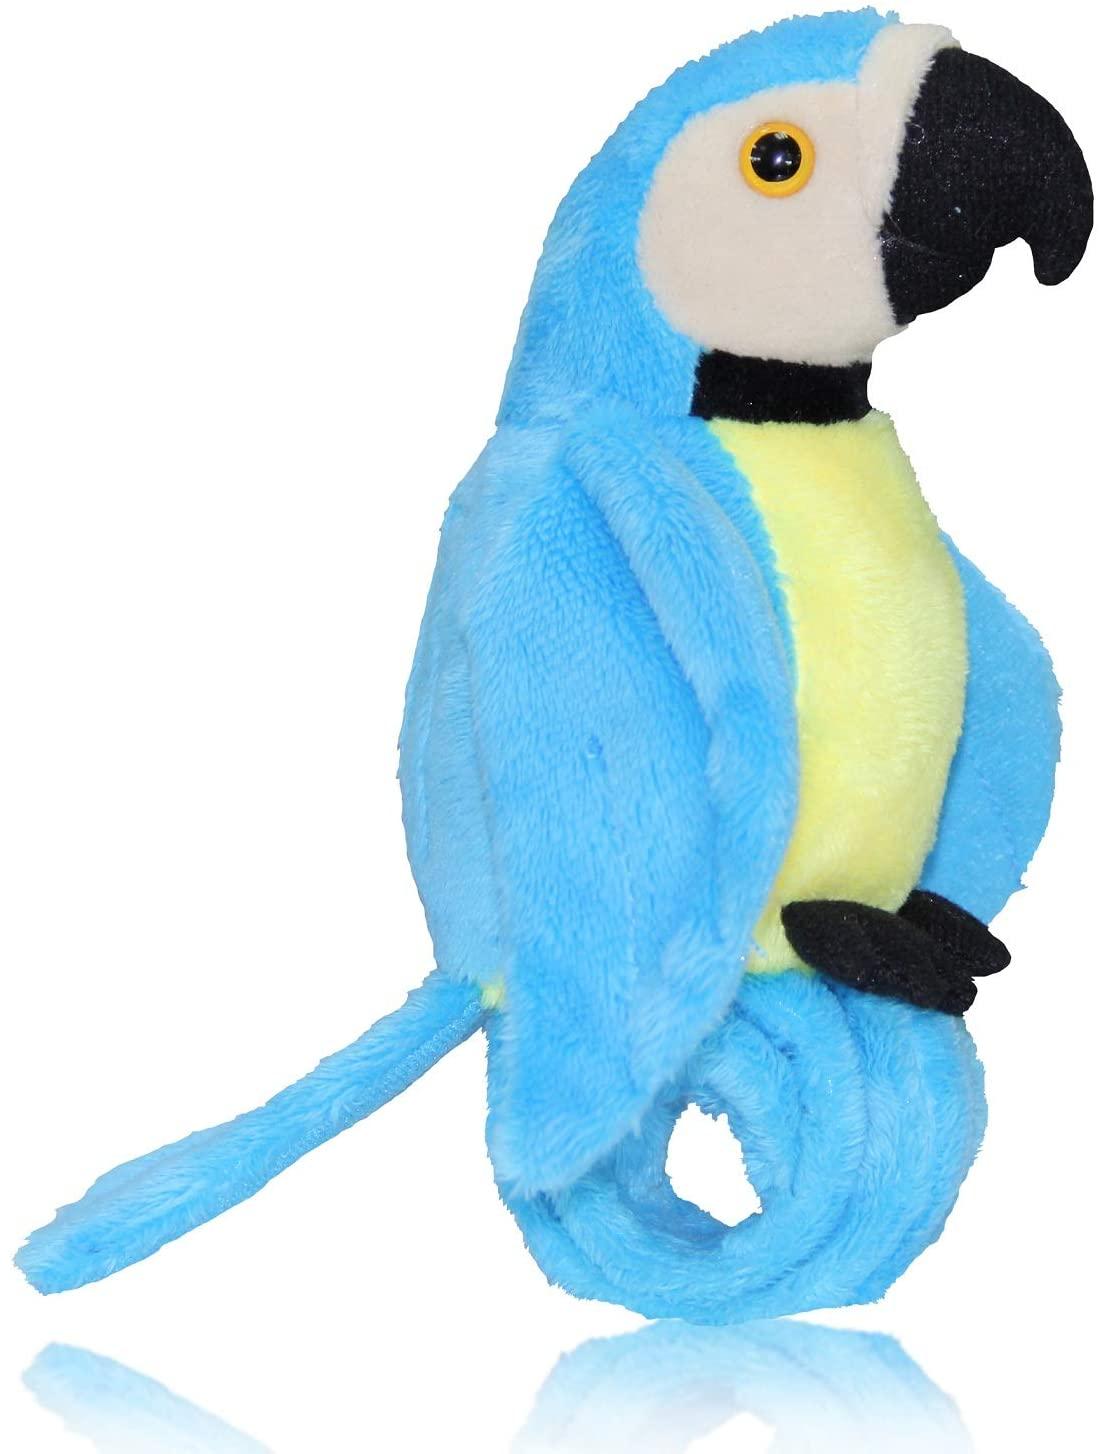 CREATIVE BONNIE Talking Parrot Plush Toy Repeats What You Say, Slap Bracelet Stuffed Animals for Kids, Interactive Mimicry Electronic Pet (Blue)